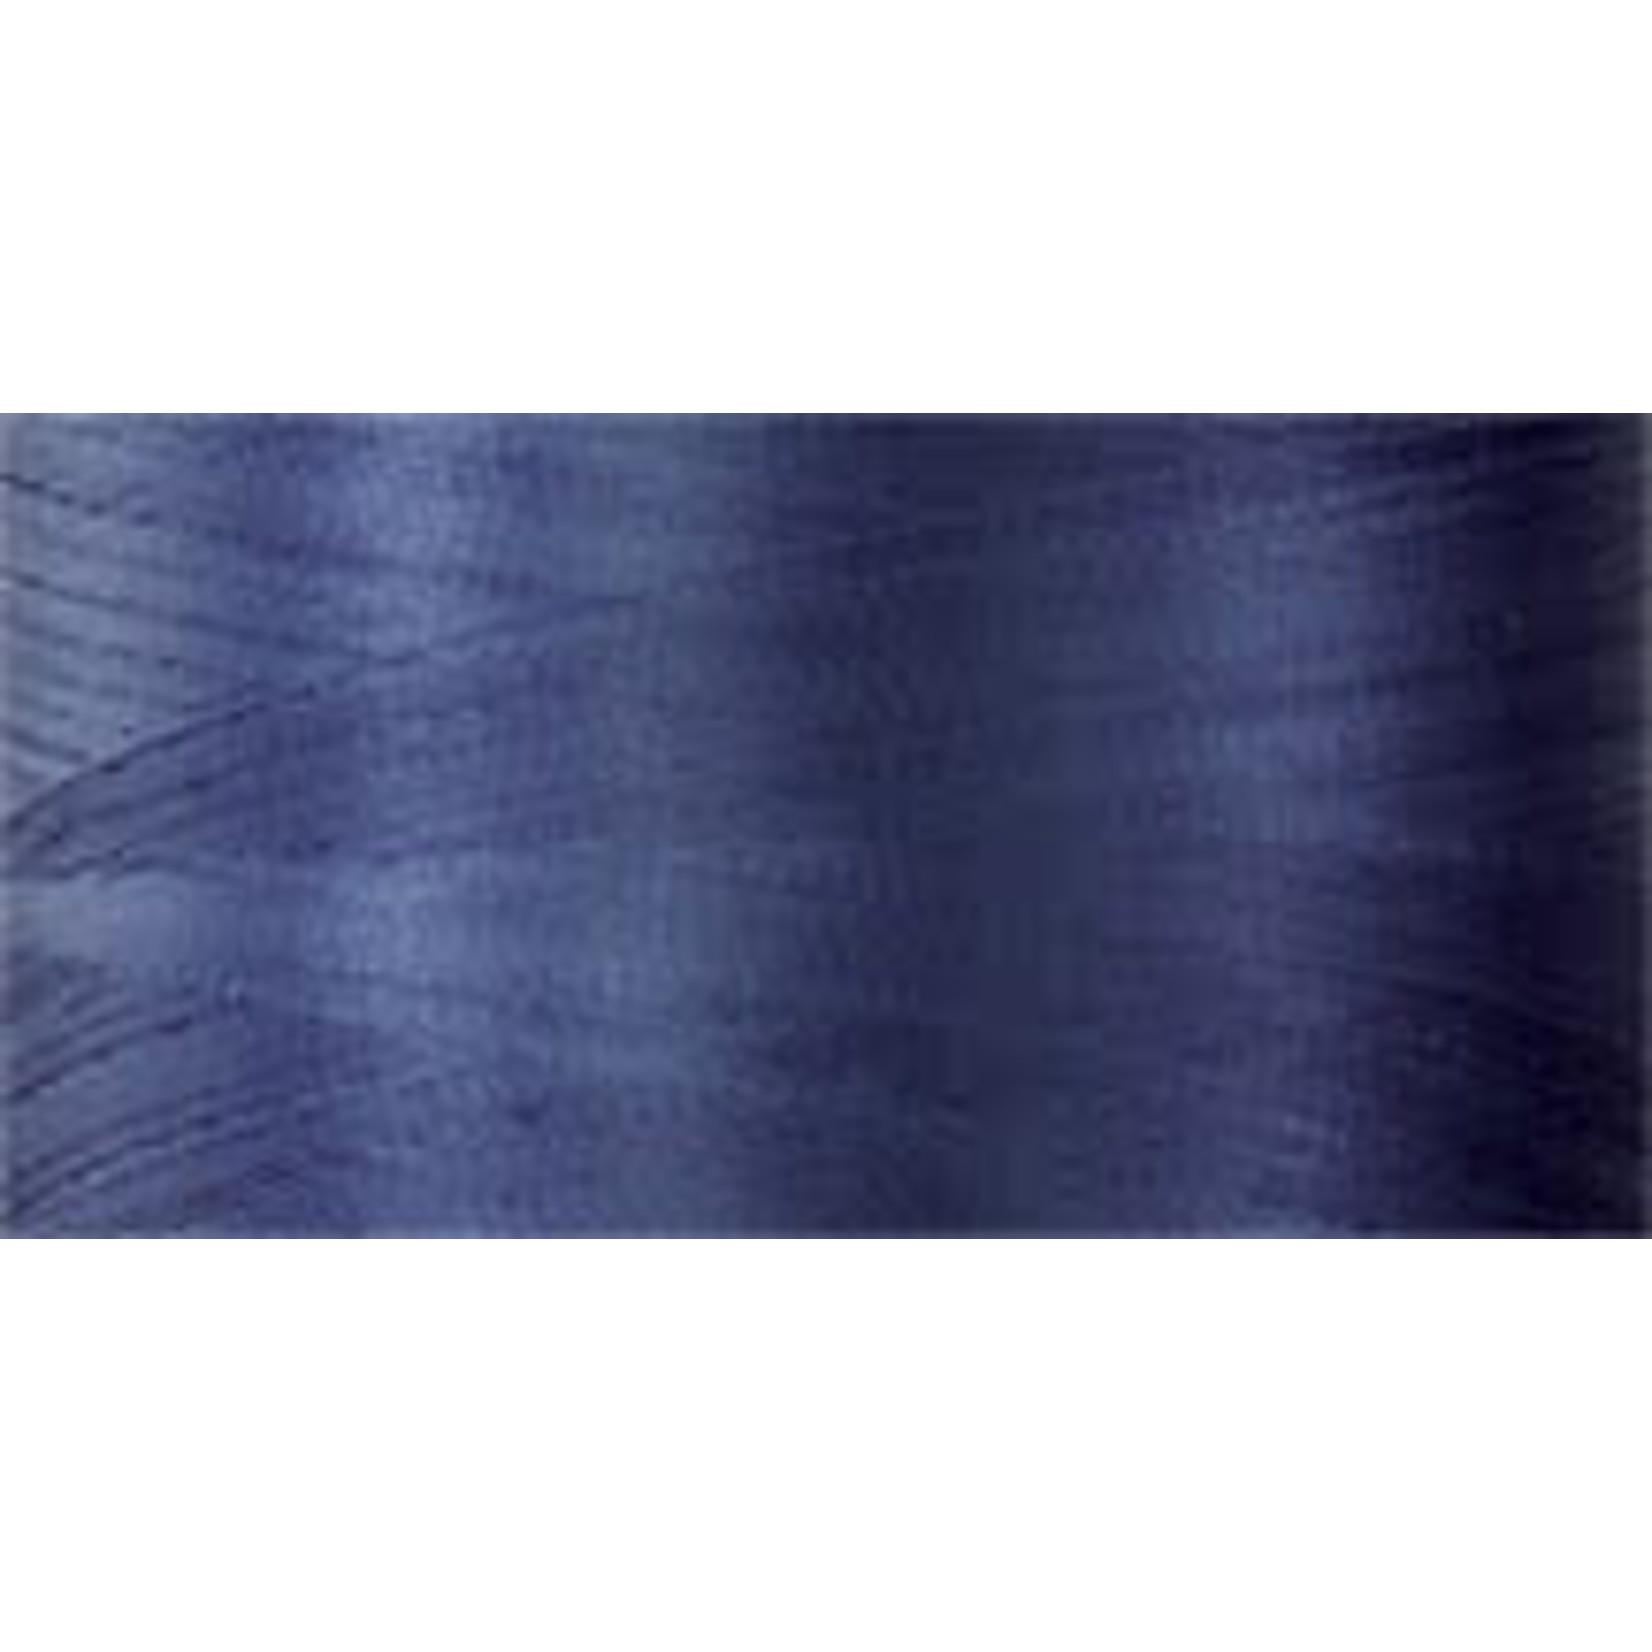 Superior Threads Bottom Line - #60 - 1300 m - 635 Medium Blue